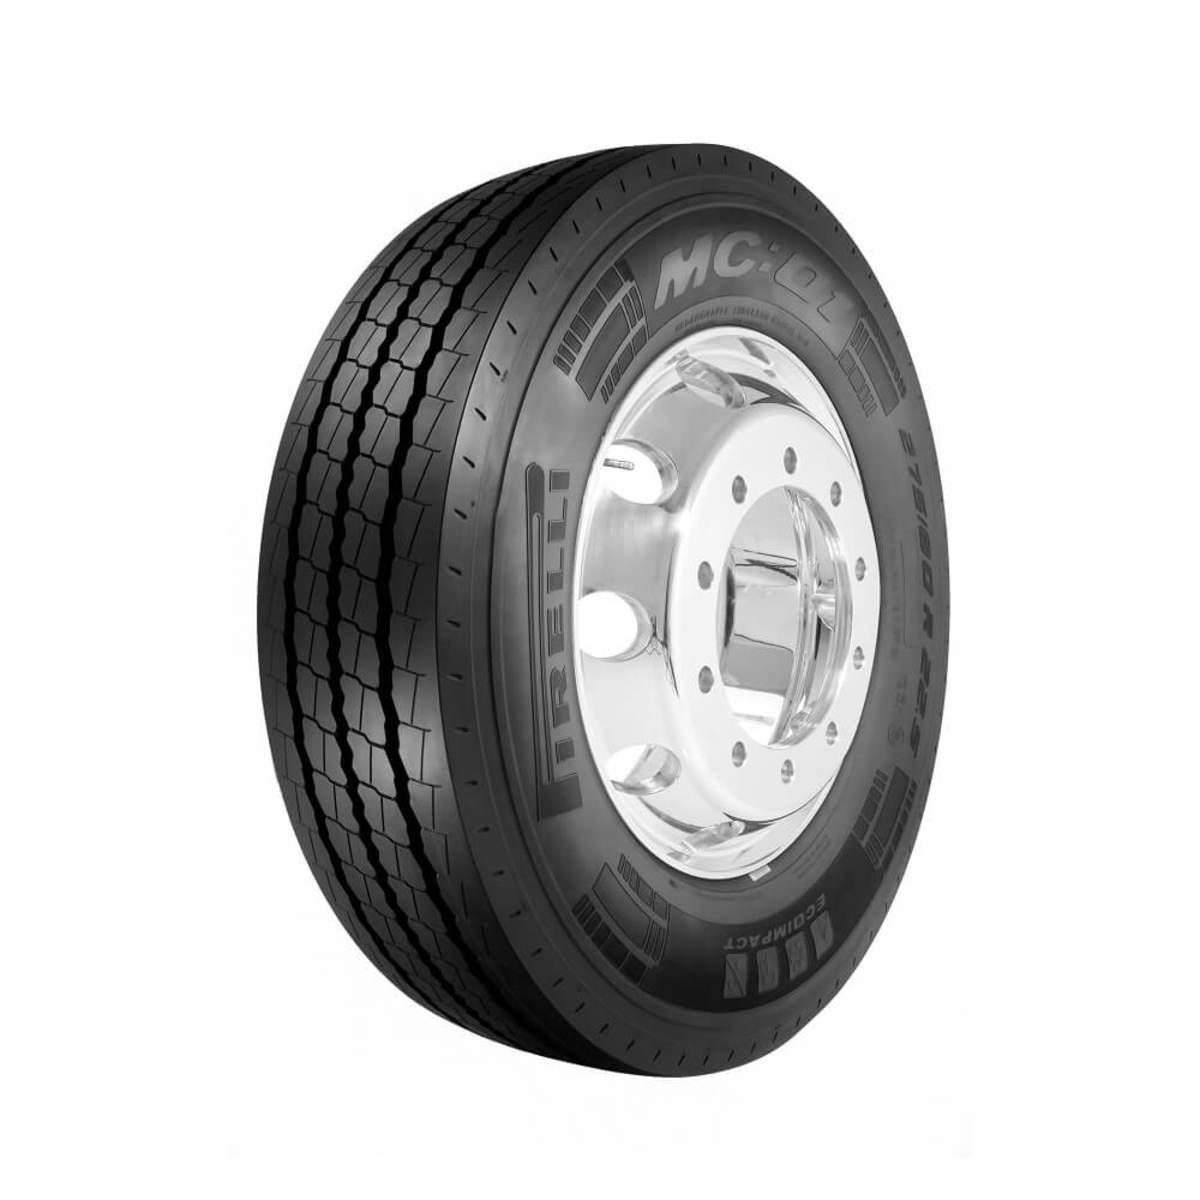 Pneu Pirelli Aro 17.5 MC01 215/75R17.5 126/124M TL 12 Lonas